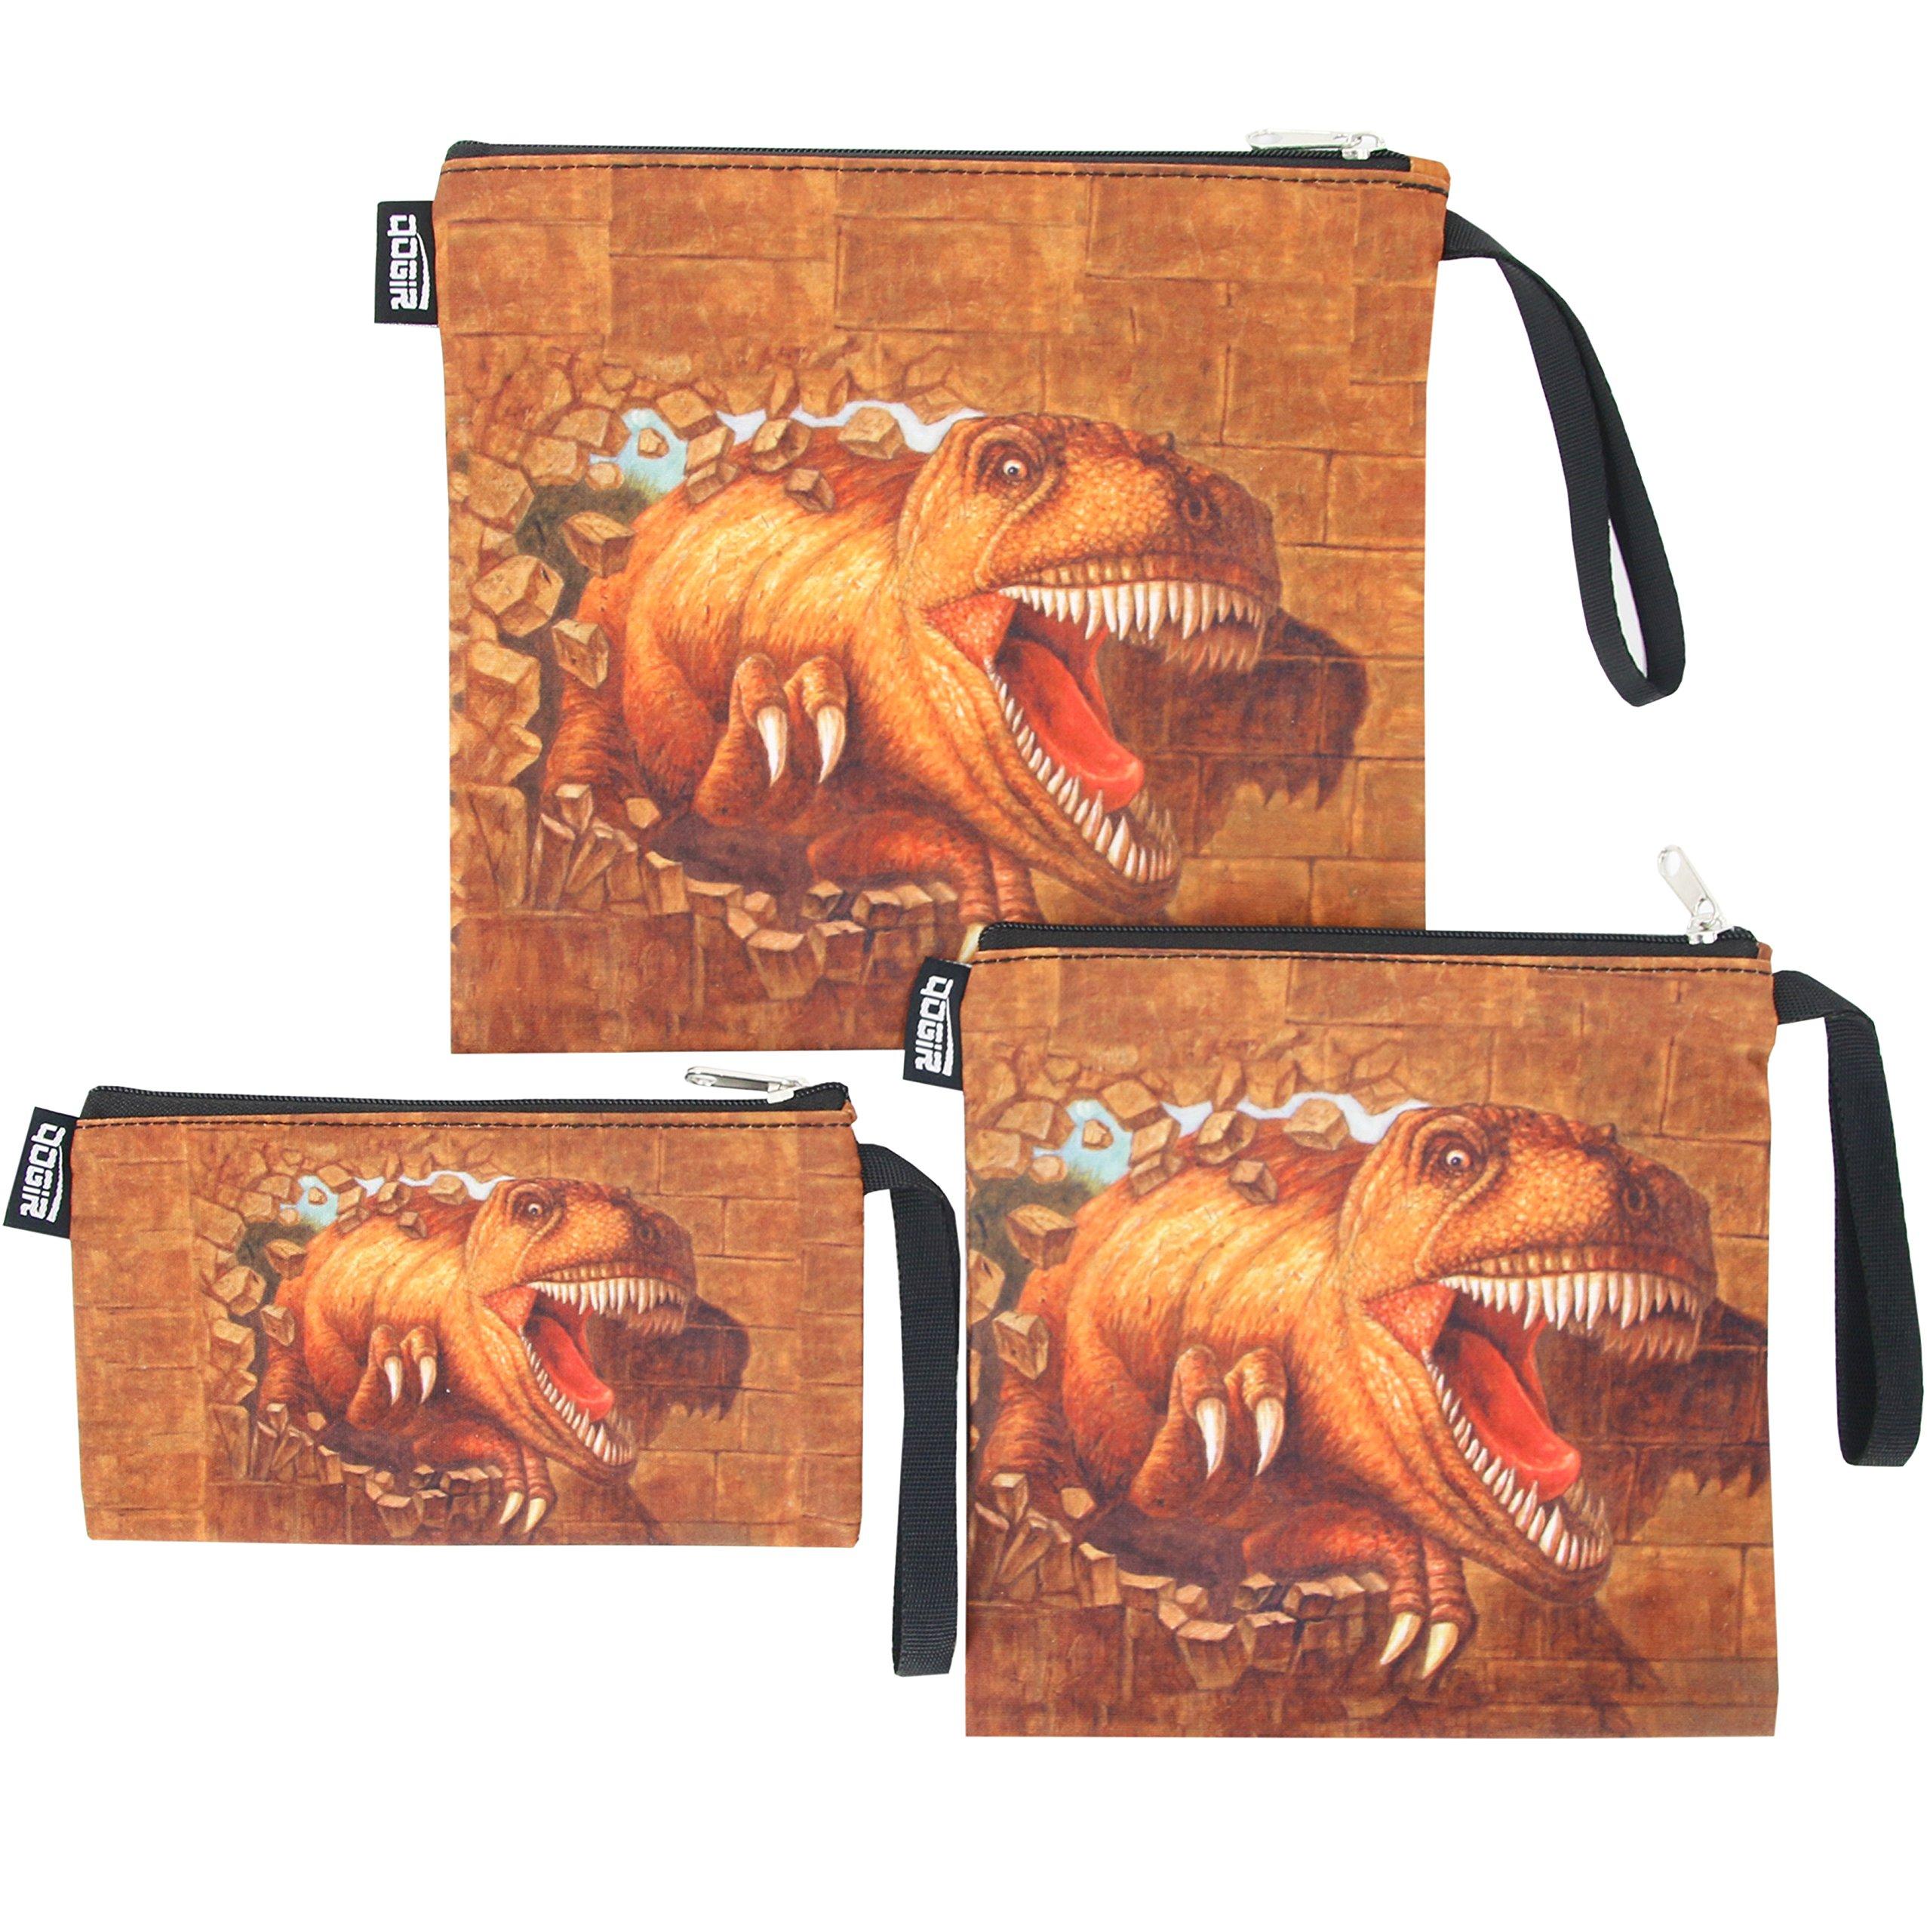 QOGiR Reusable Snack Bags Sandwich Bags Handle: Lead-free,BPA-free,PVC-free,FDA PASSED (Brown Dinosaur)